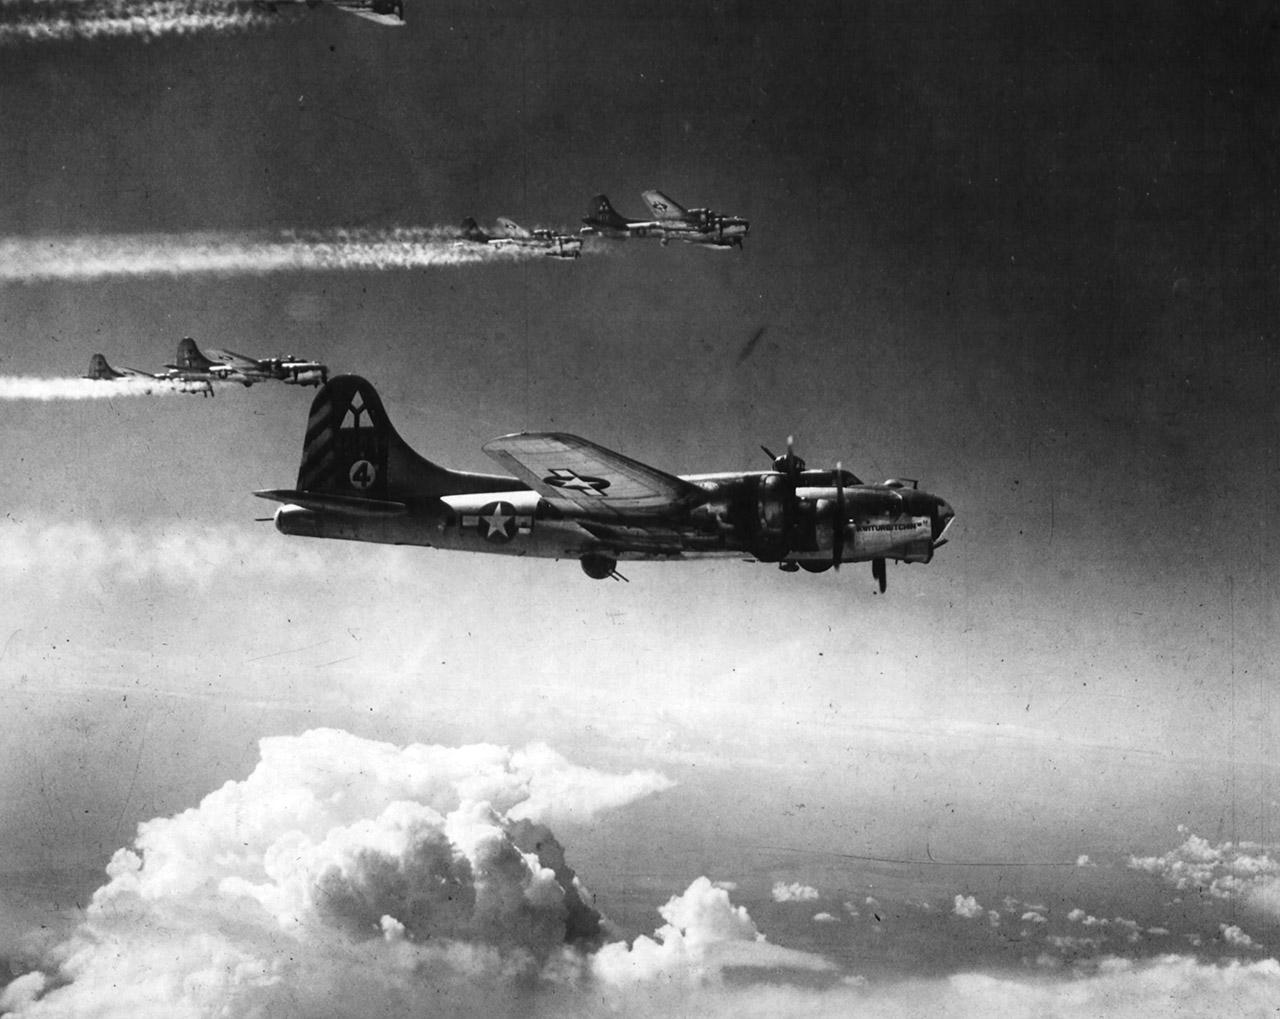 B-17 #44-6544 / Kwiturbitchin II